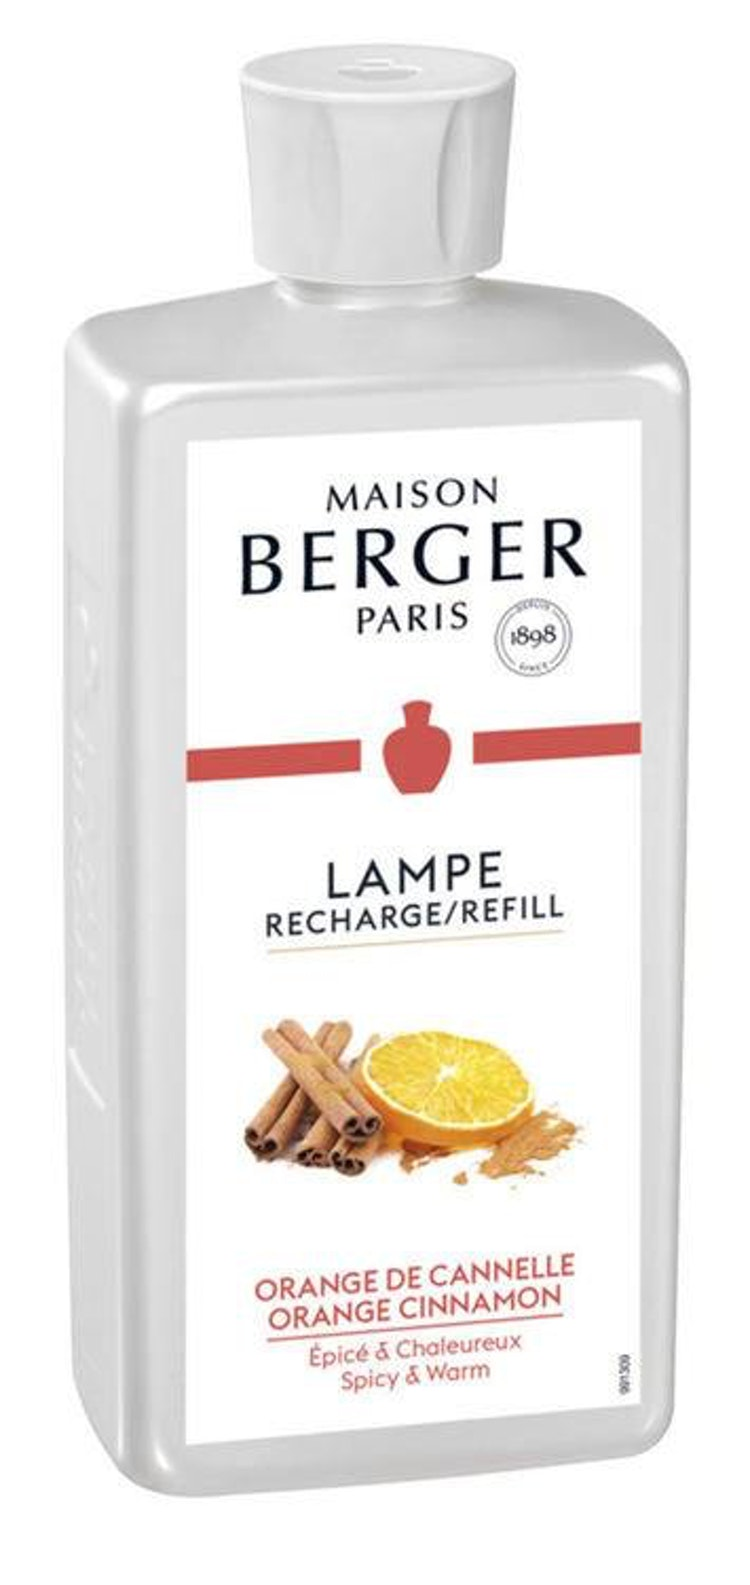 Doft Spicy & Warm - Maison Berger (Lampe Berger) Paris